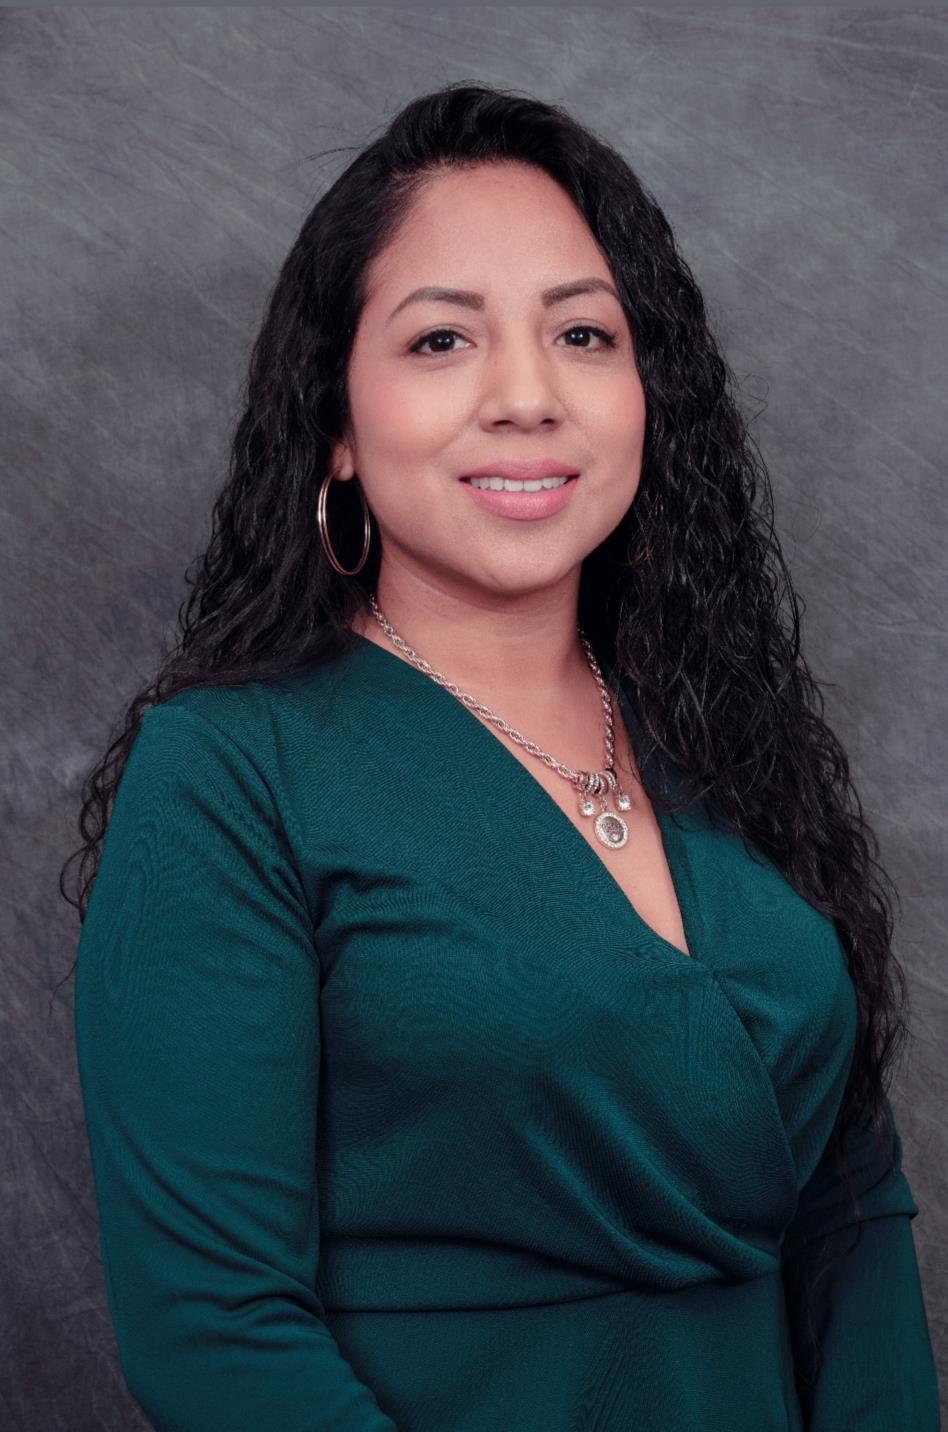 Silvia Villa - Farmers Insurance Agent in Ossining, NY